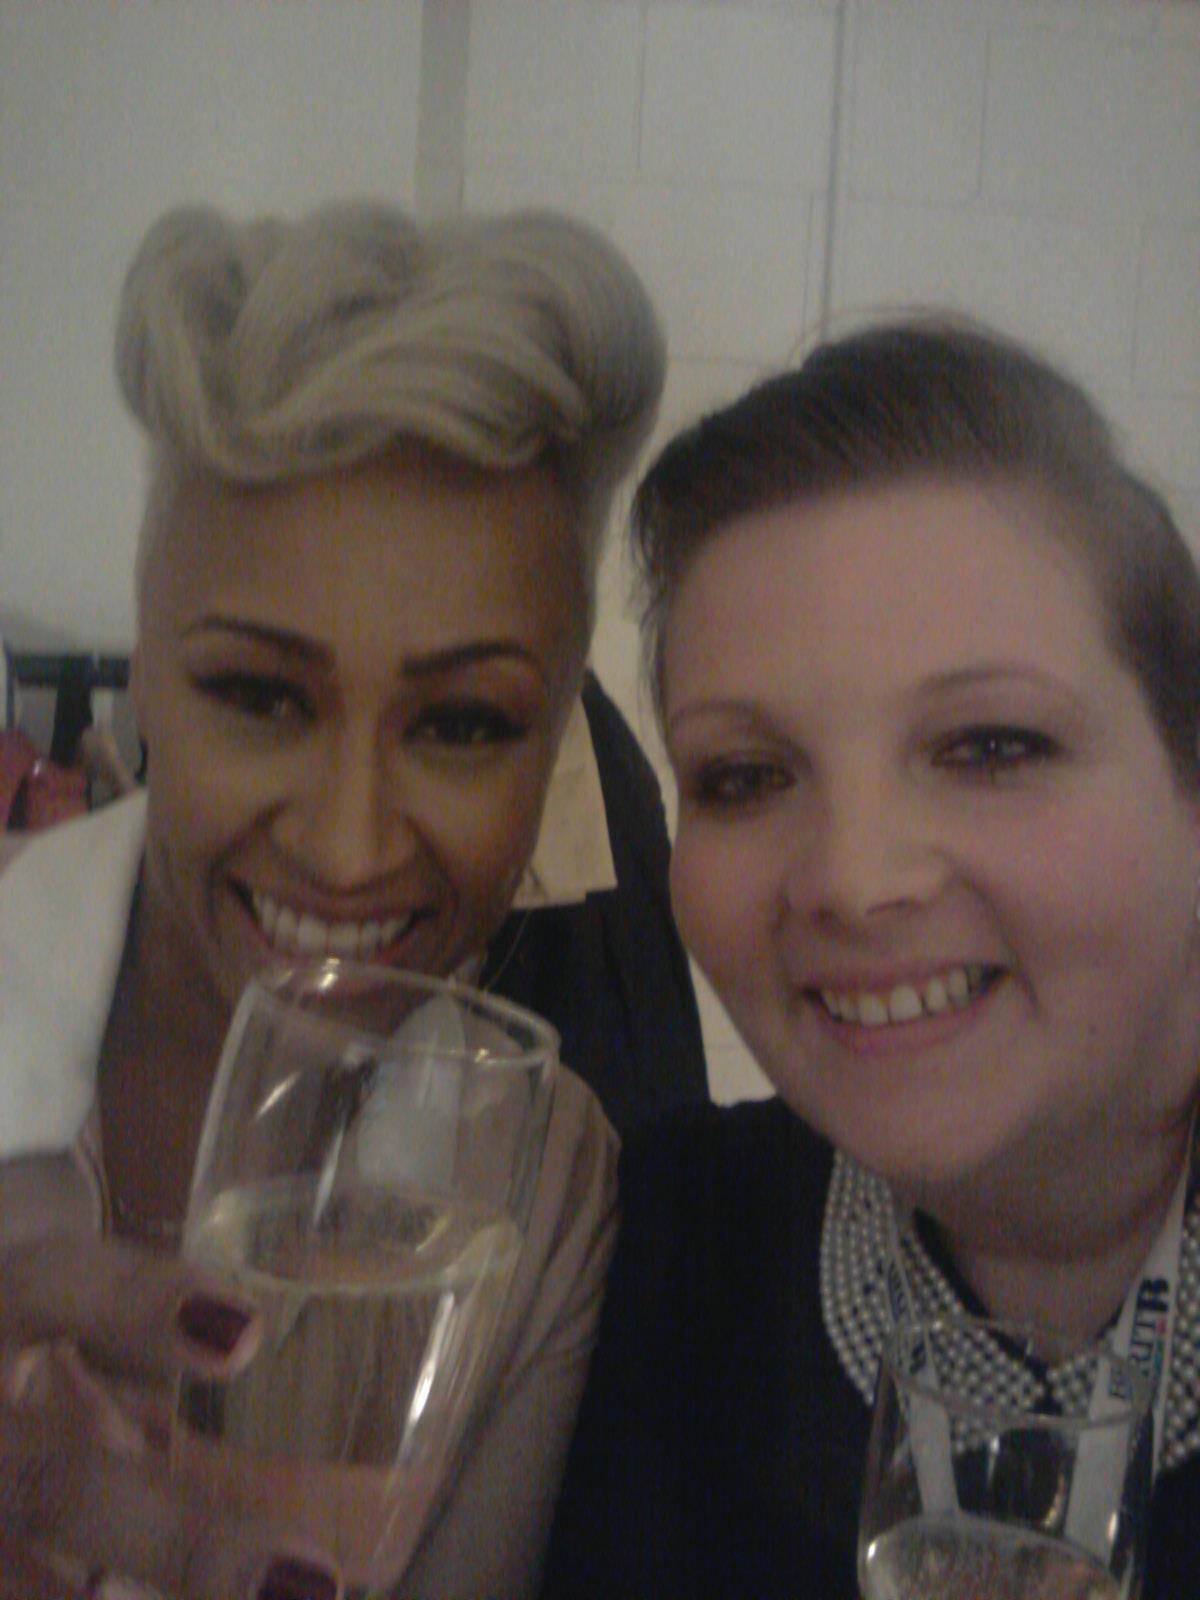 Emeli Sandé at the Brit Awards